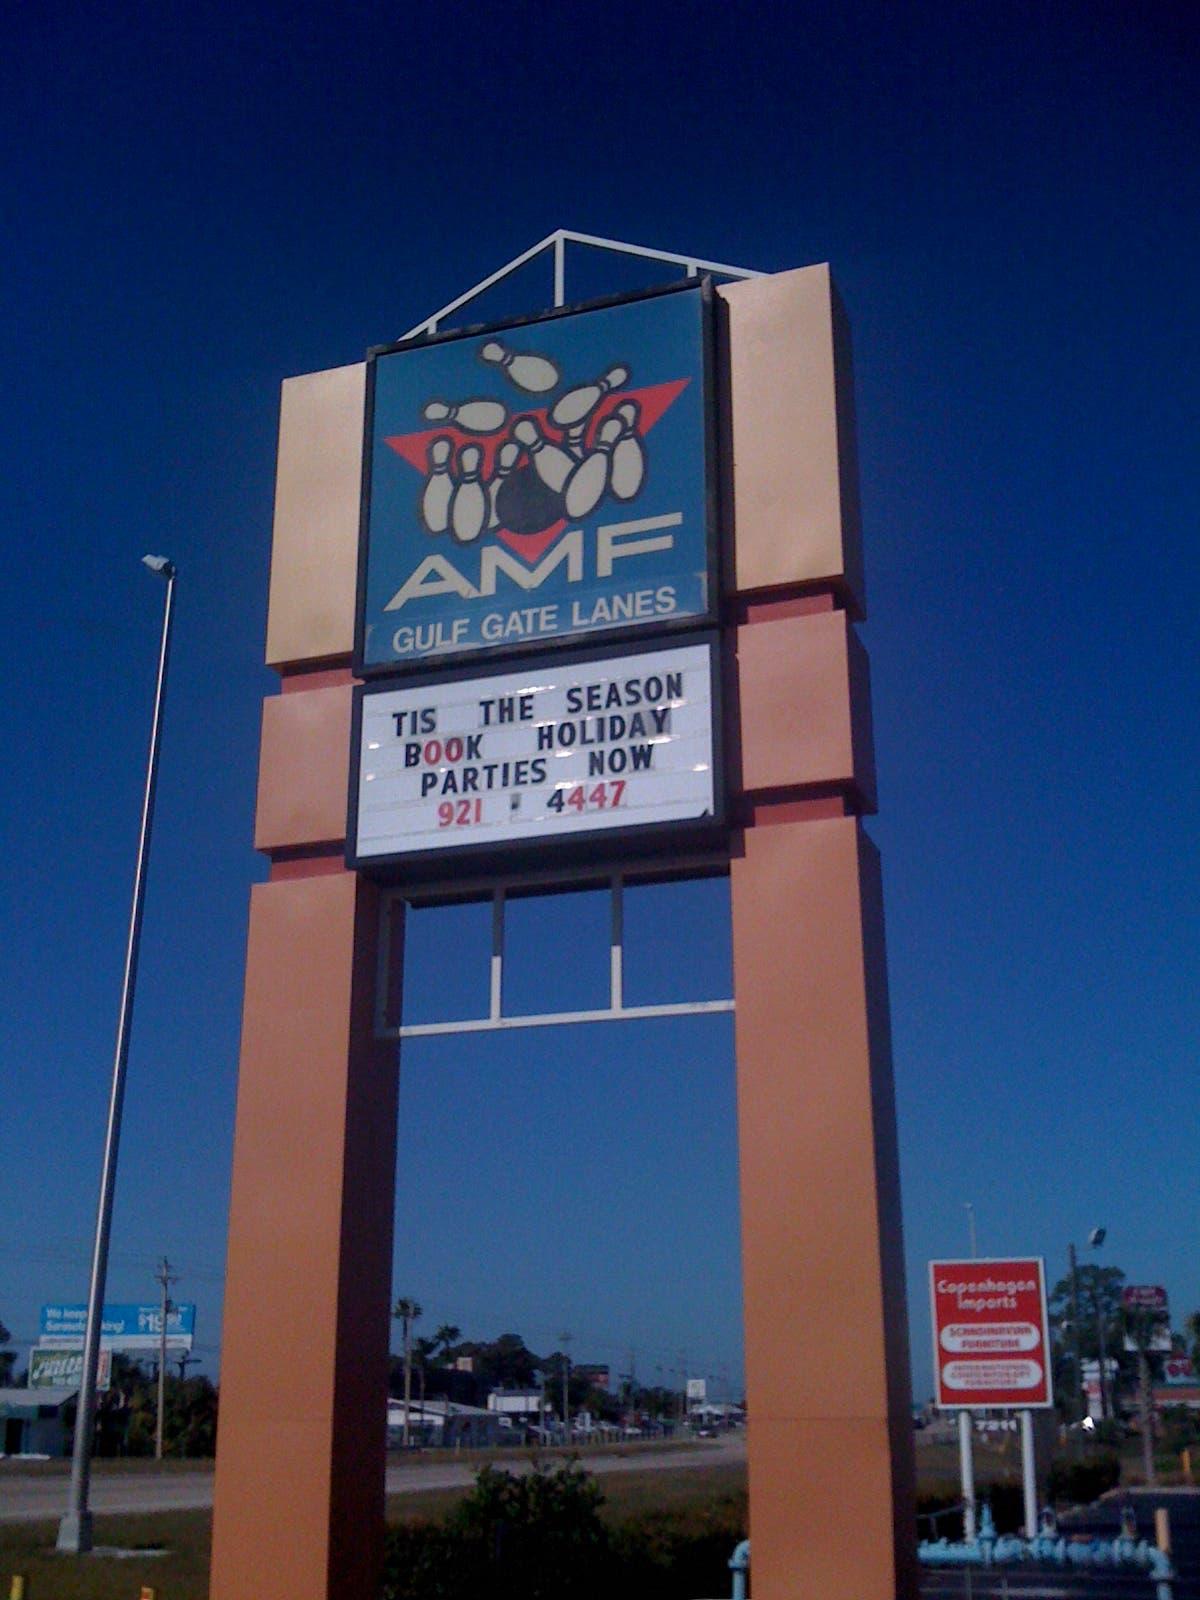 eb78d47f4 The Main Event: Xtreme Bowling at AMF Gulf Gate Lanes   Sarasota, FL ...